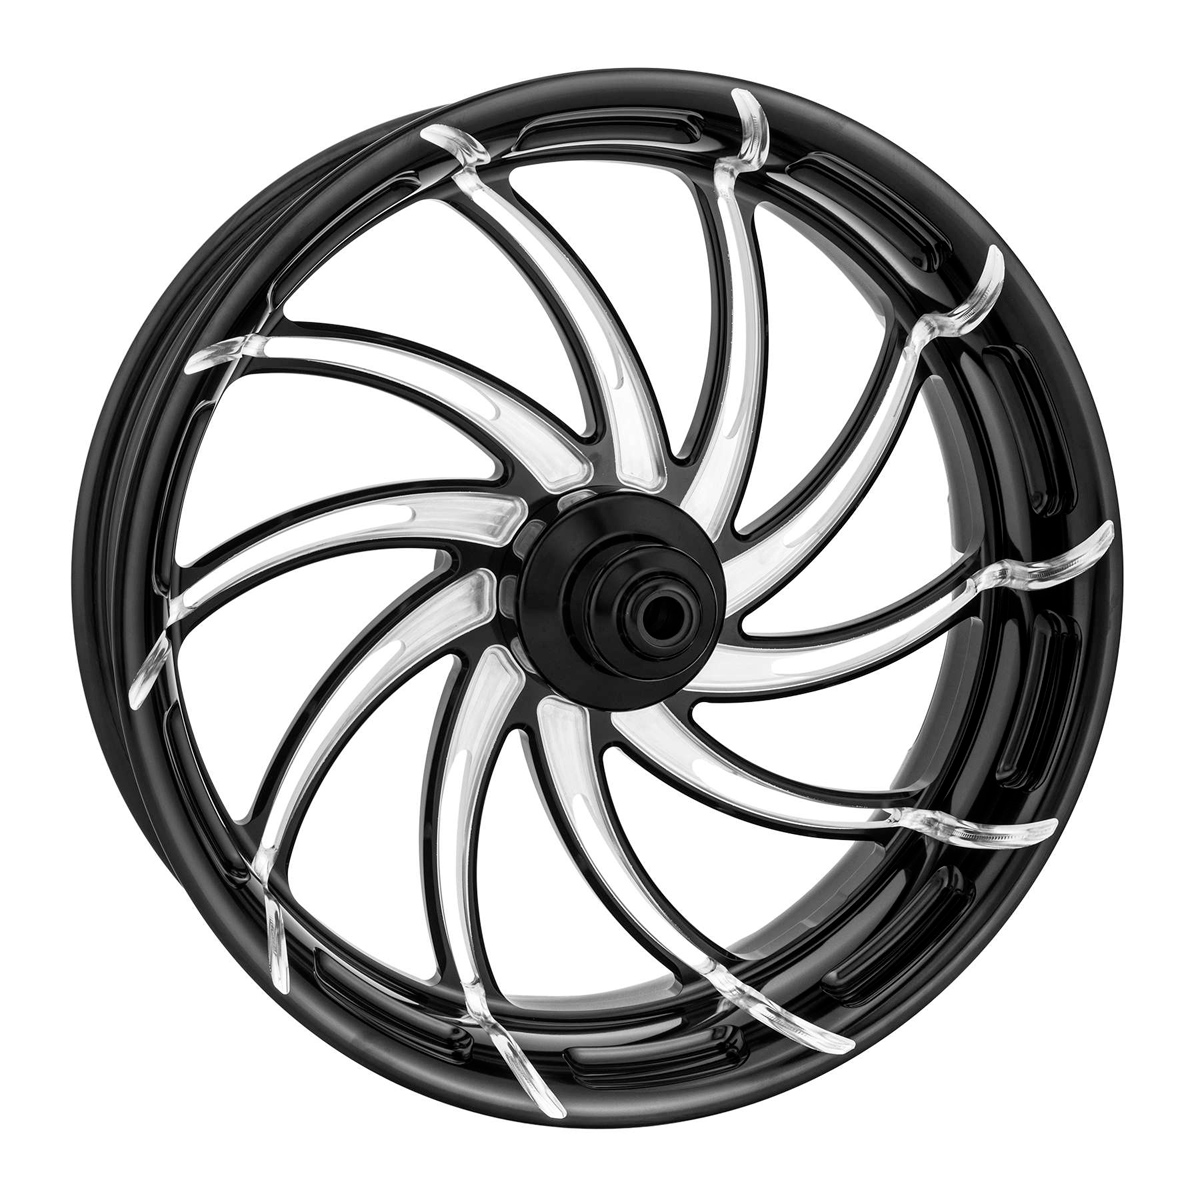 Performance Machine Supra Platinum Cut Rear Wheel 18x4.25 ABS